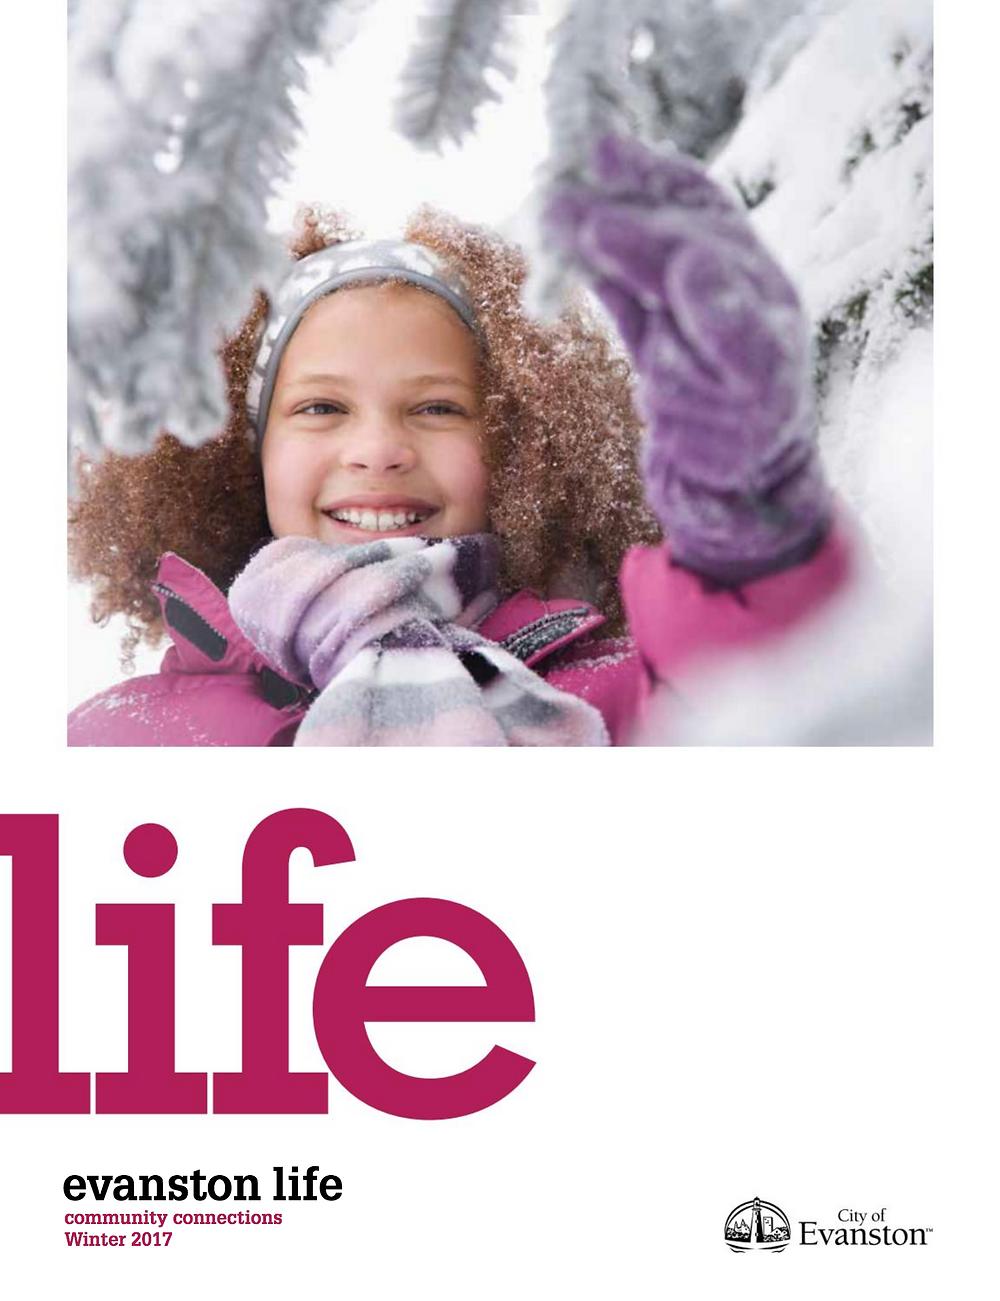 Evanston Life magazine